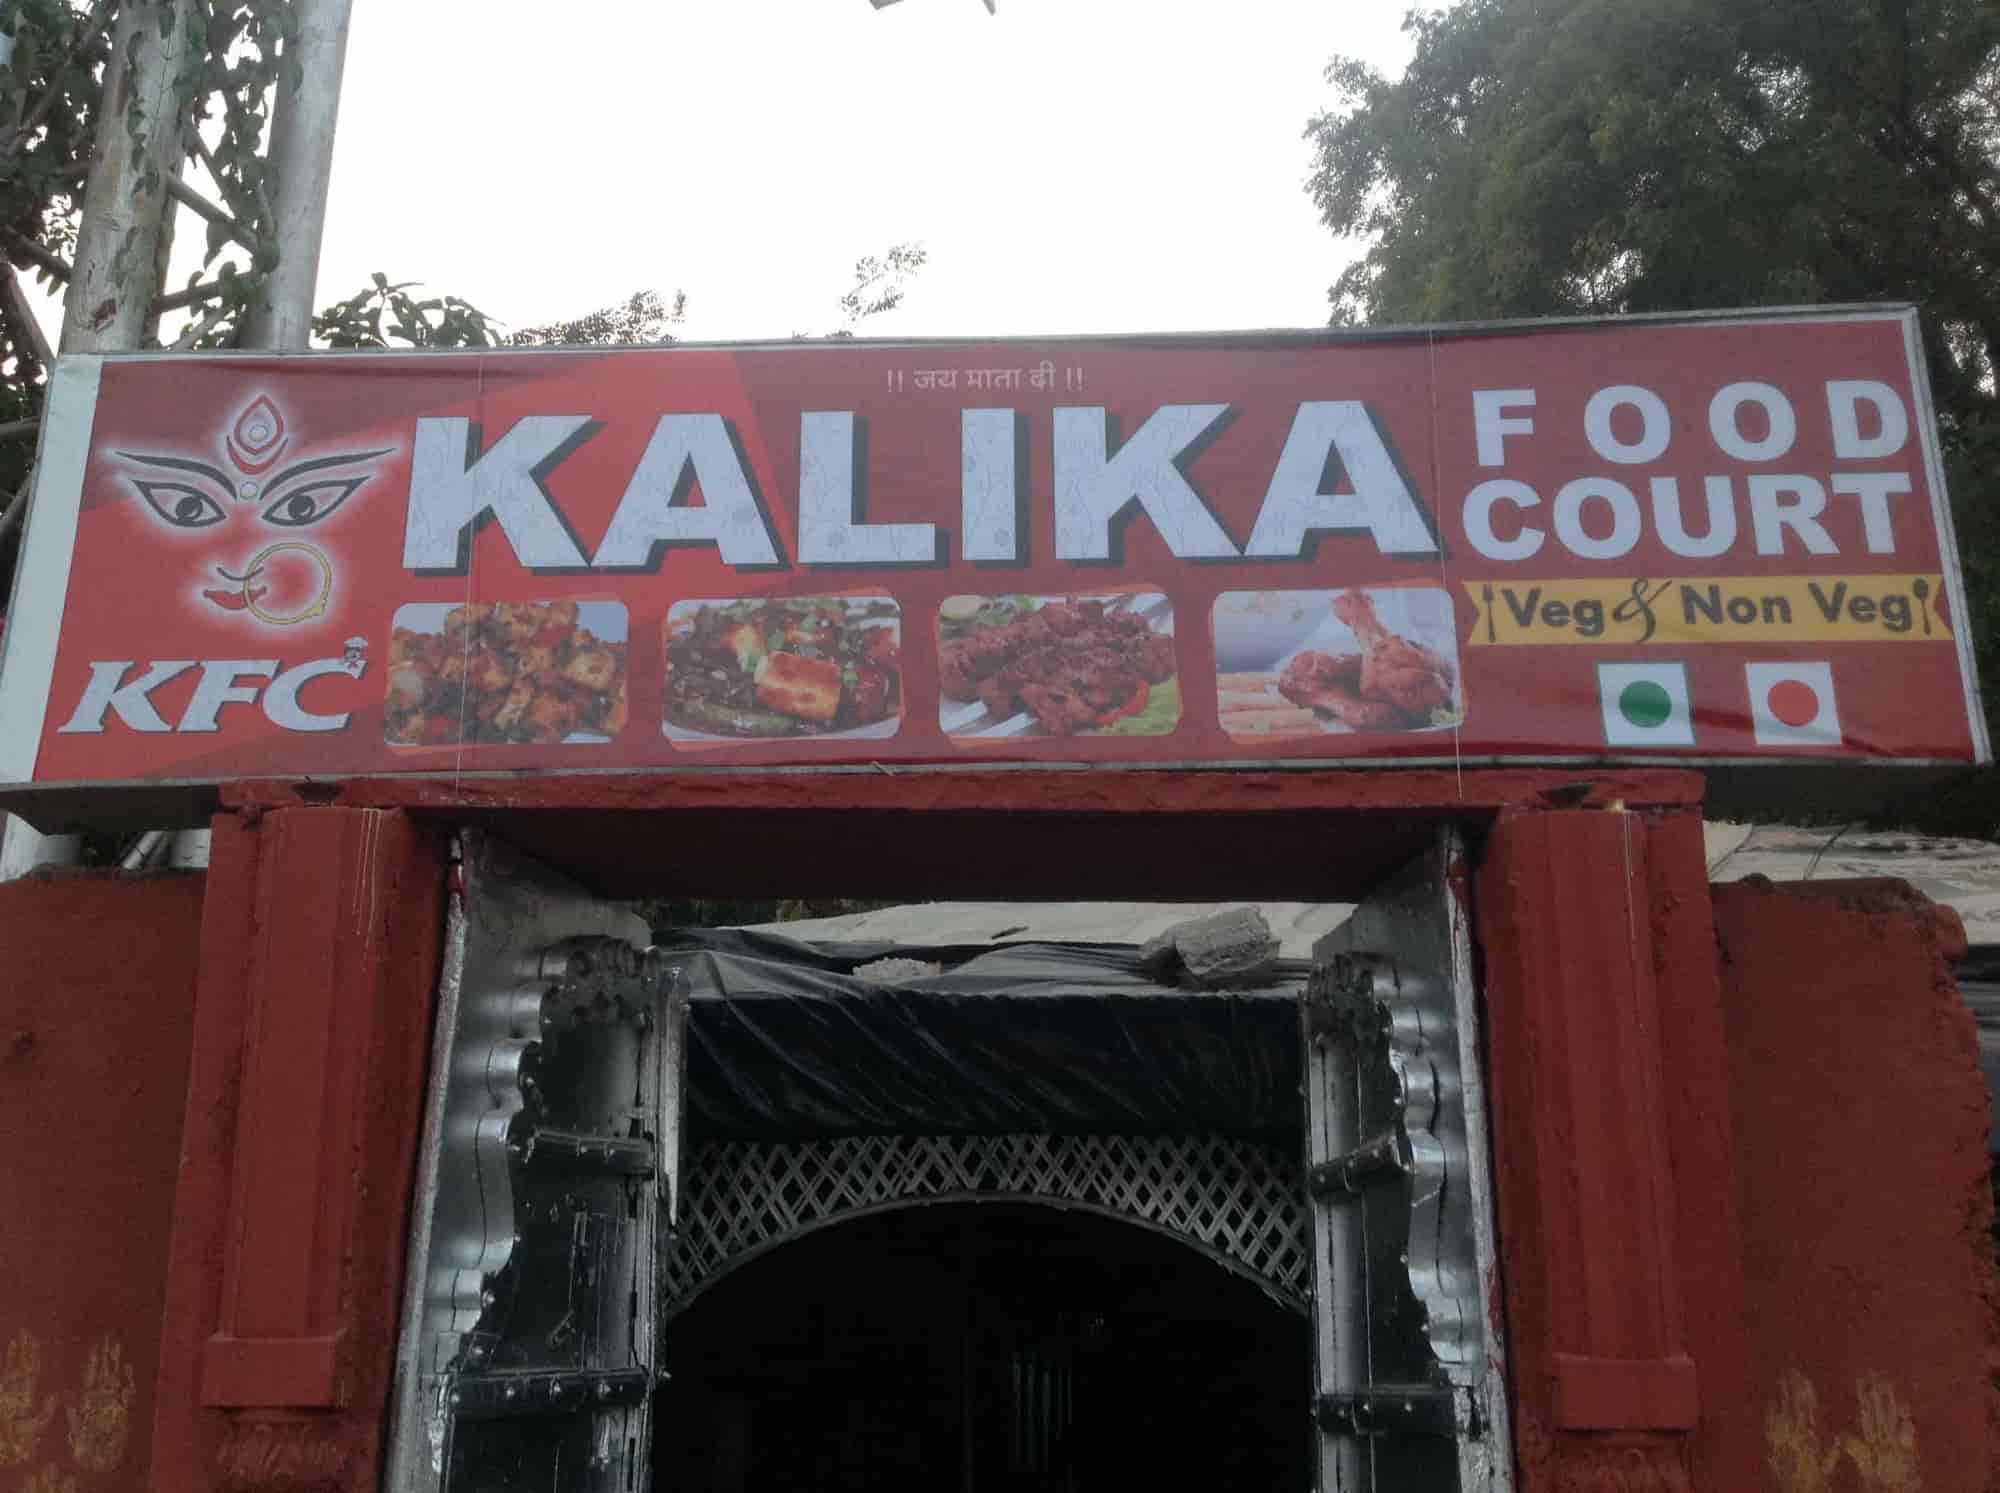 KFC Kalika Food Court Bhuwana Udaipur Rajasthan Restaurants